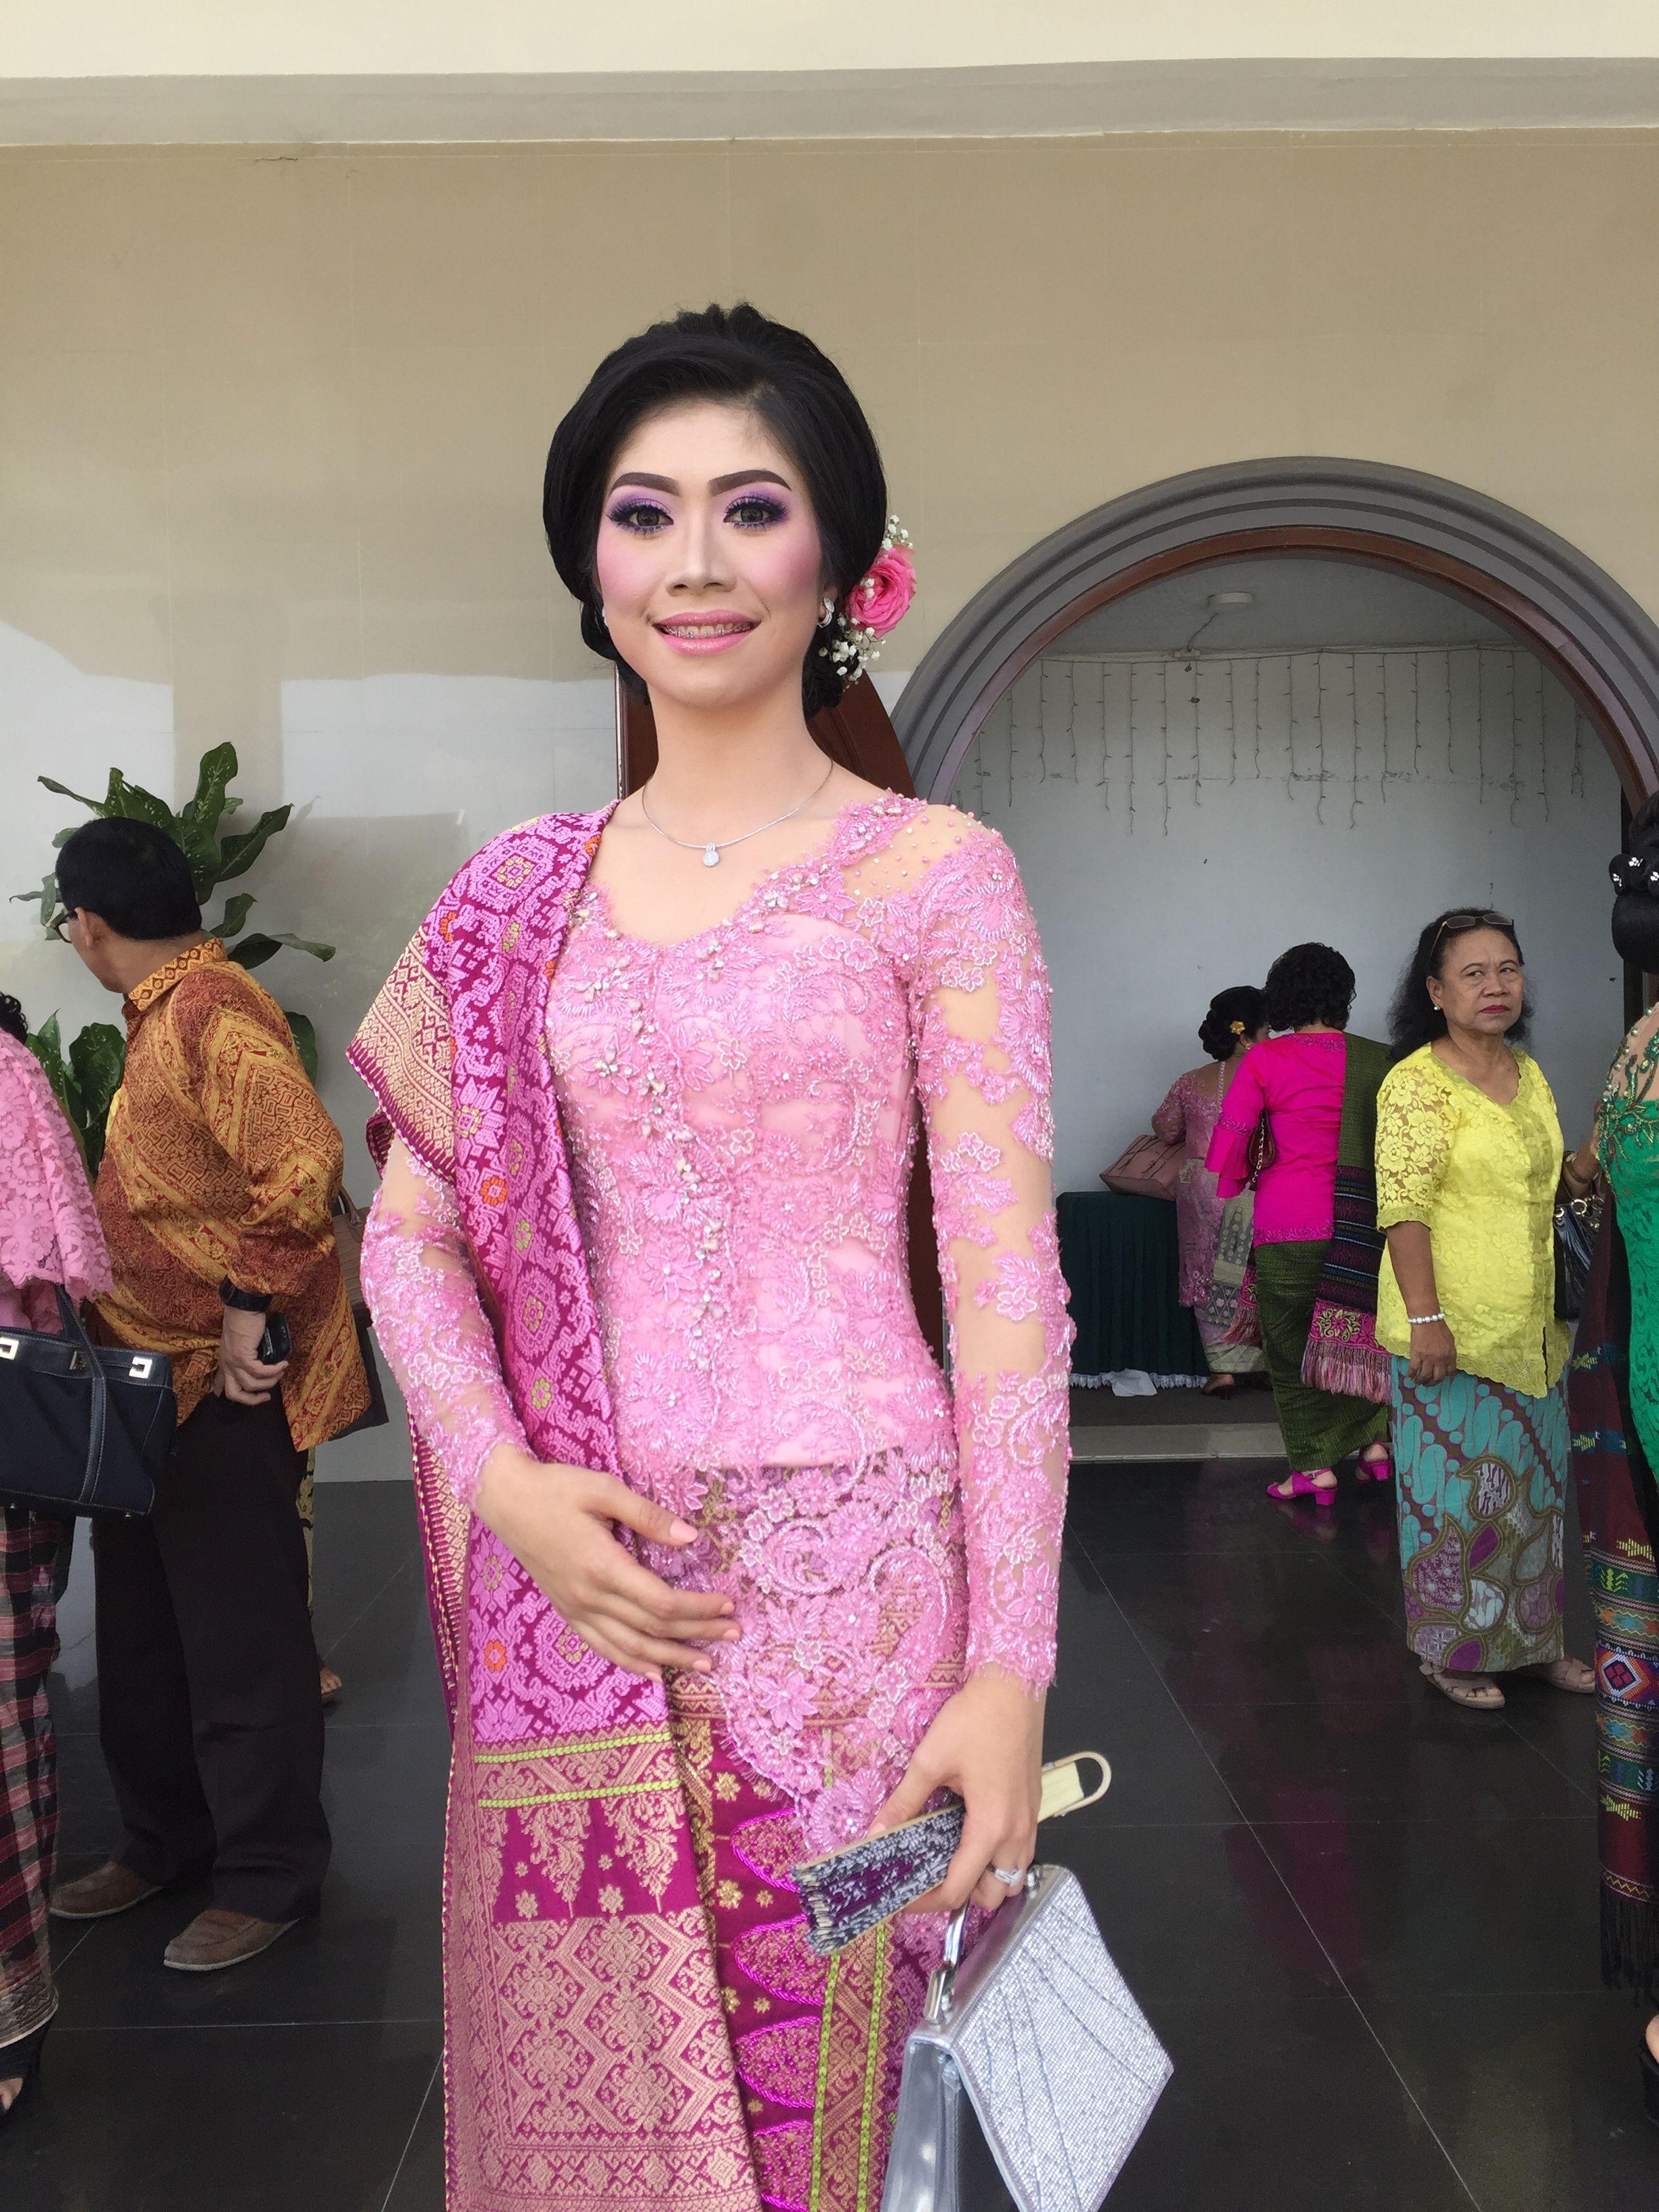 Pakaian Adat Jawa Timur Adalah